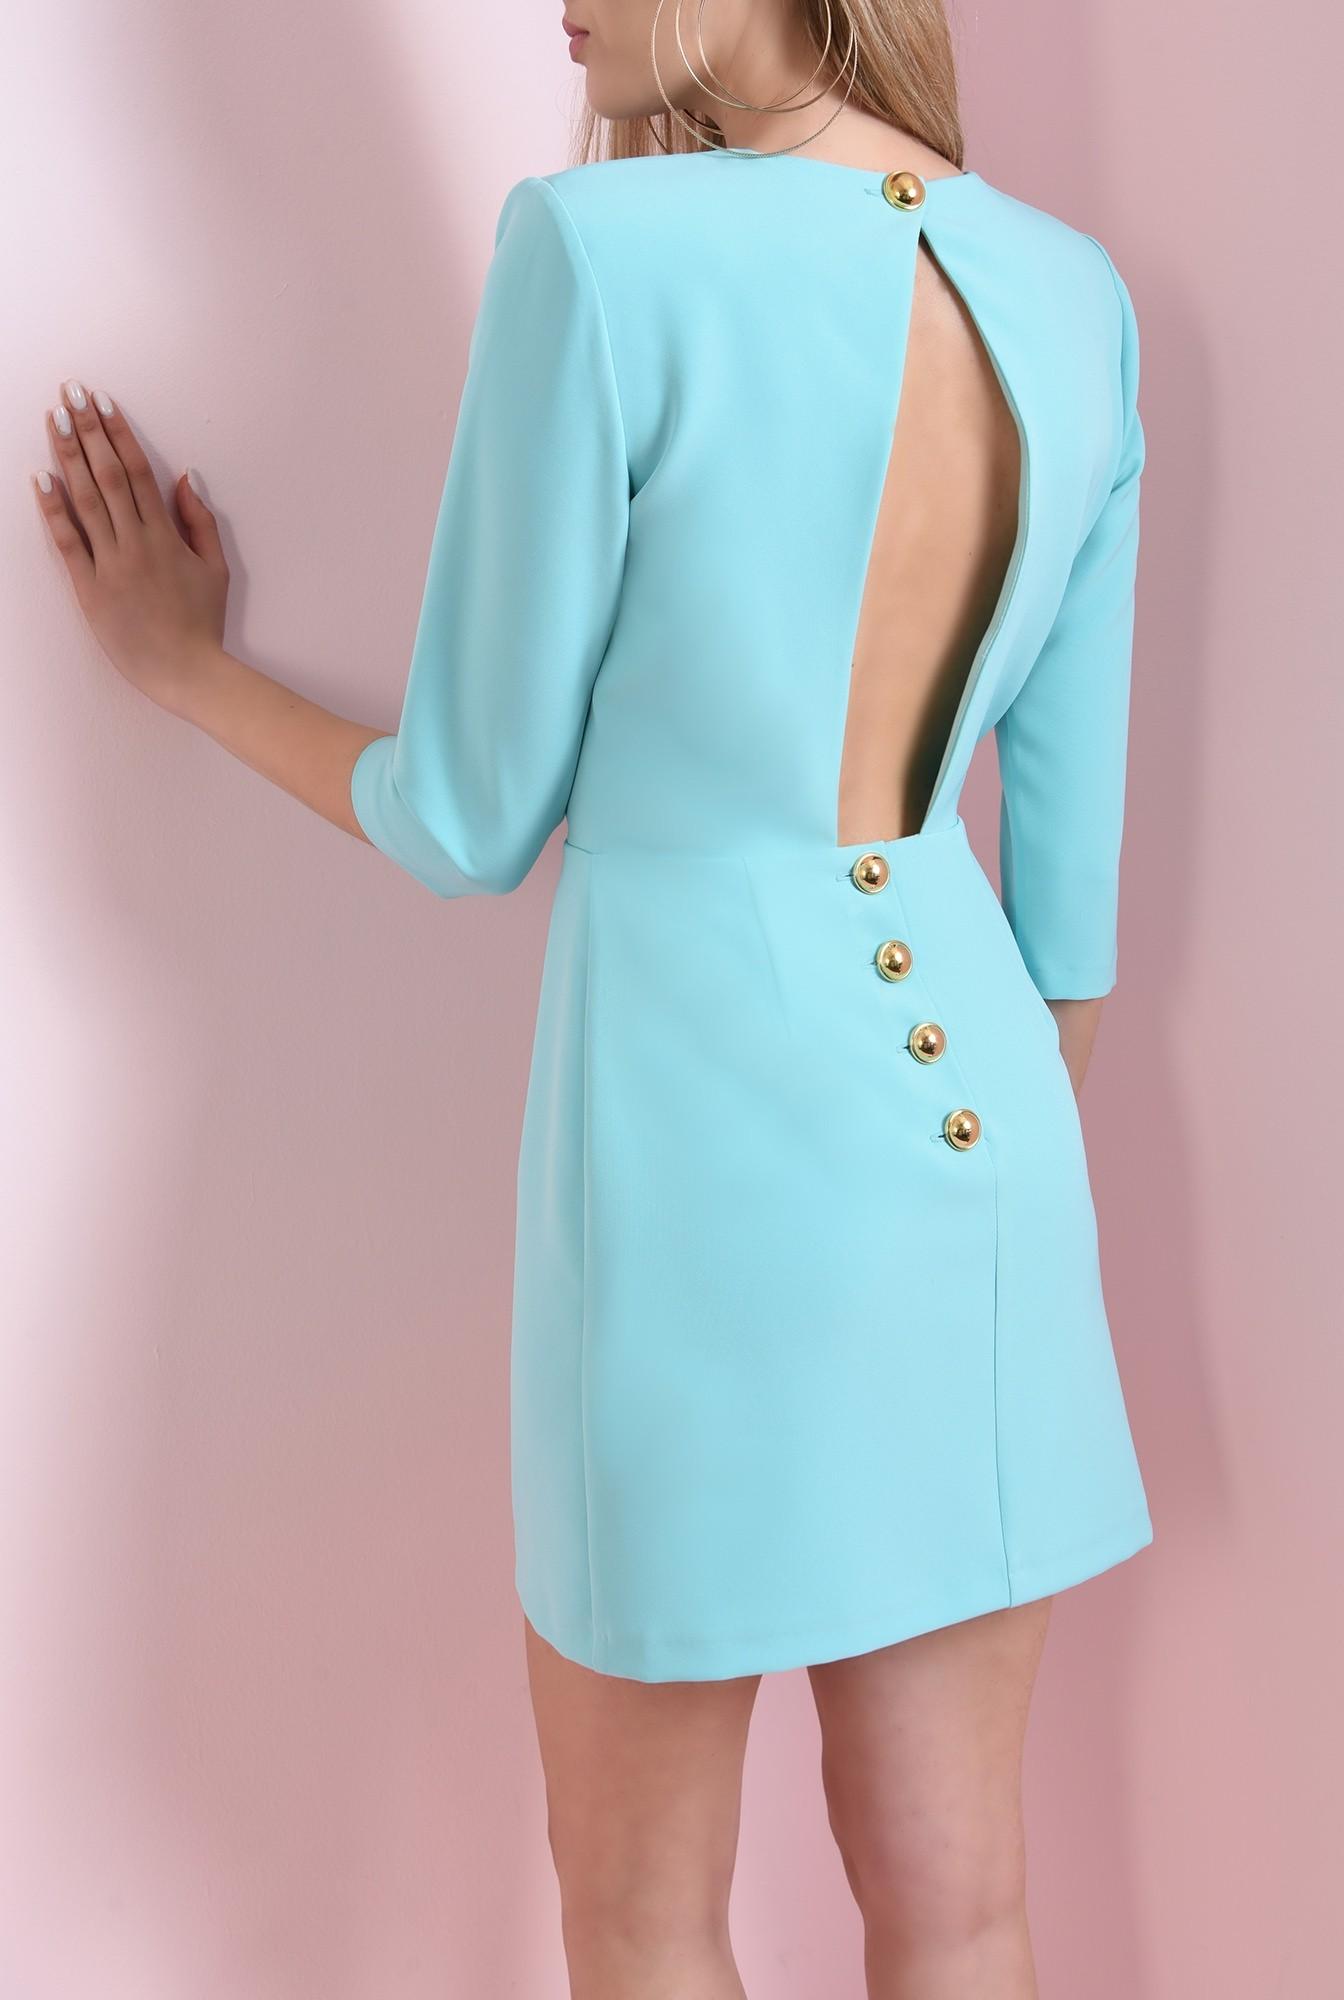 0 - 360 - rochie mini, turcoaz, cu decupaj